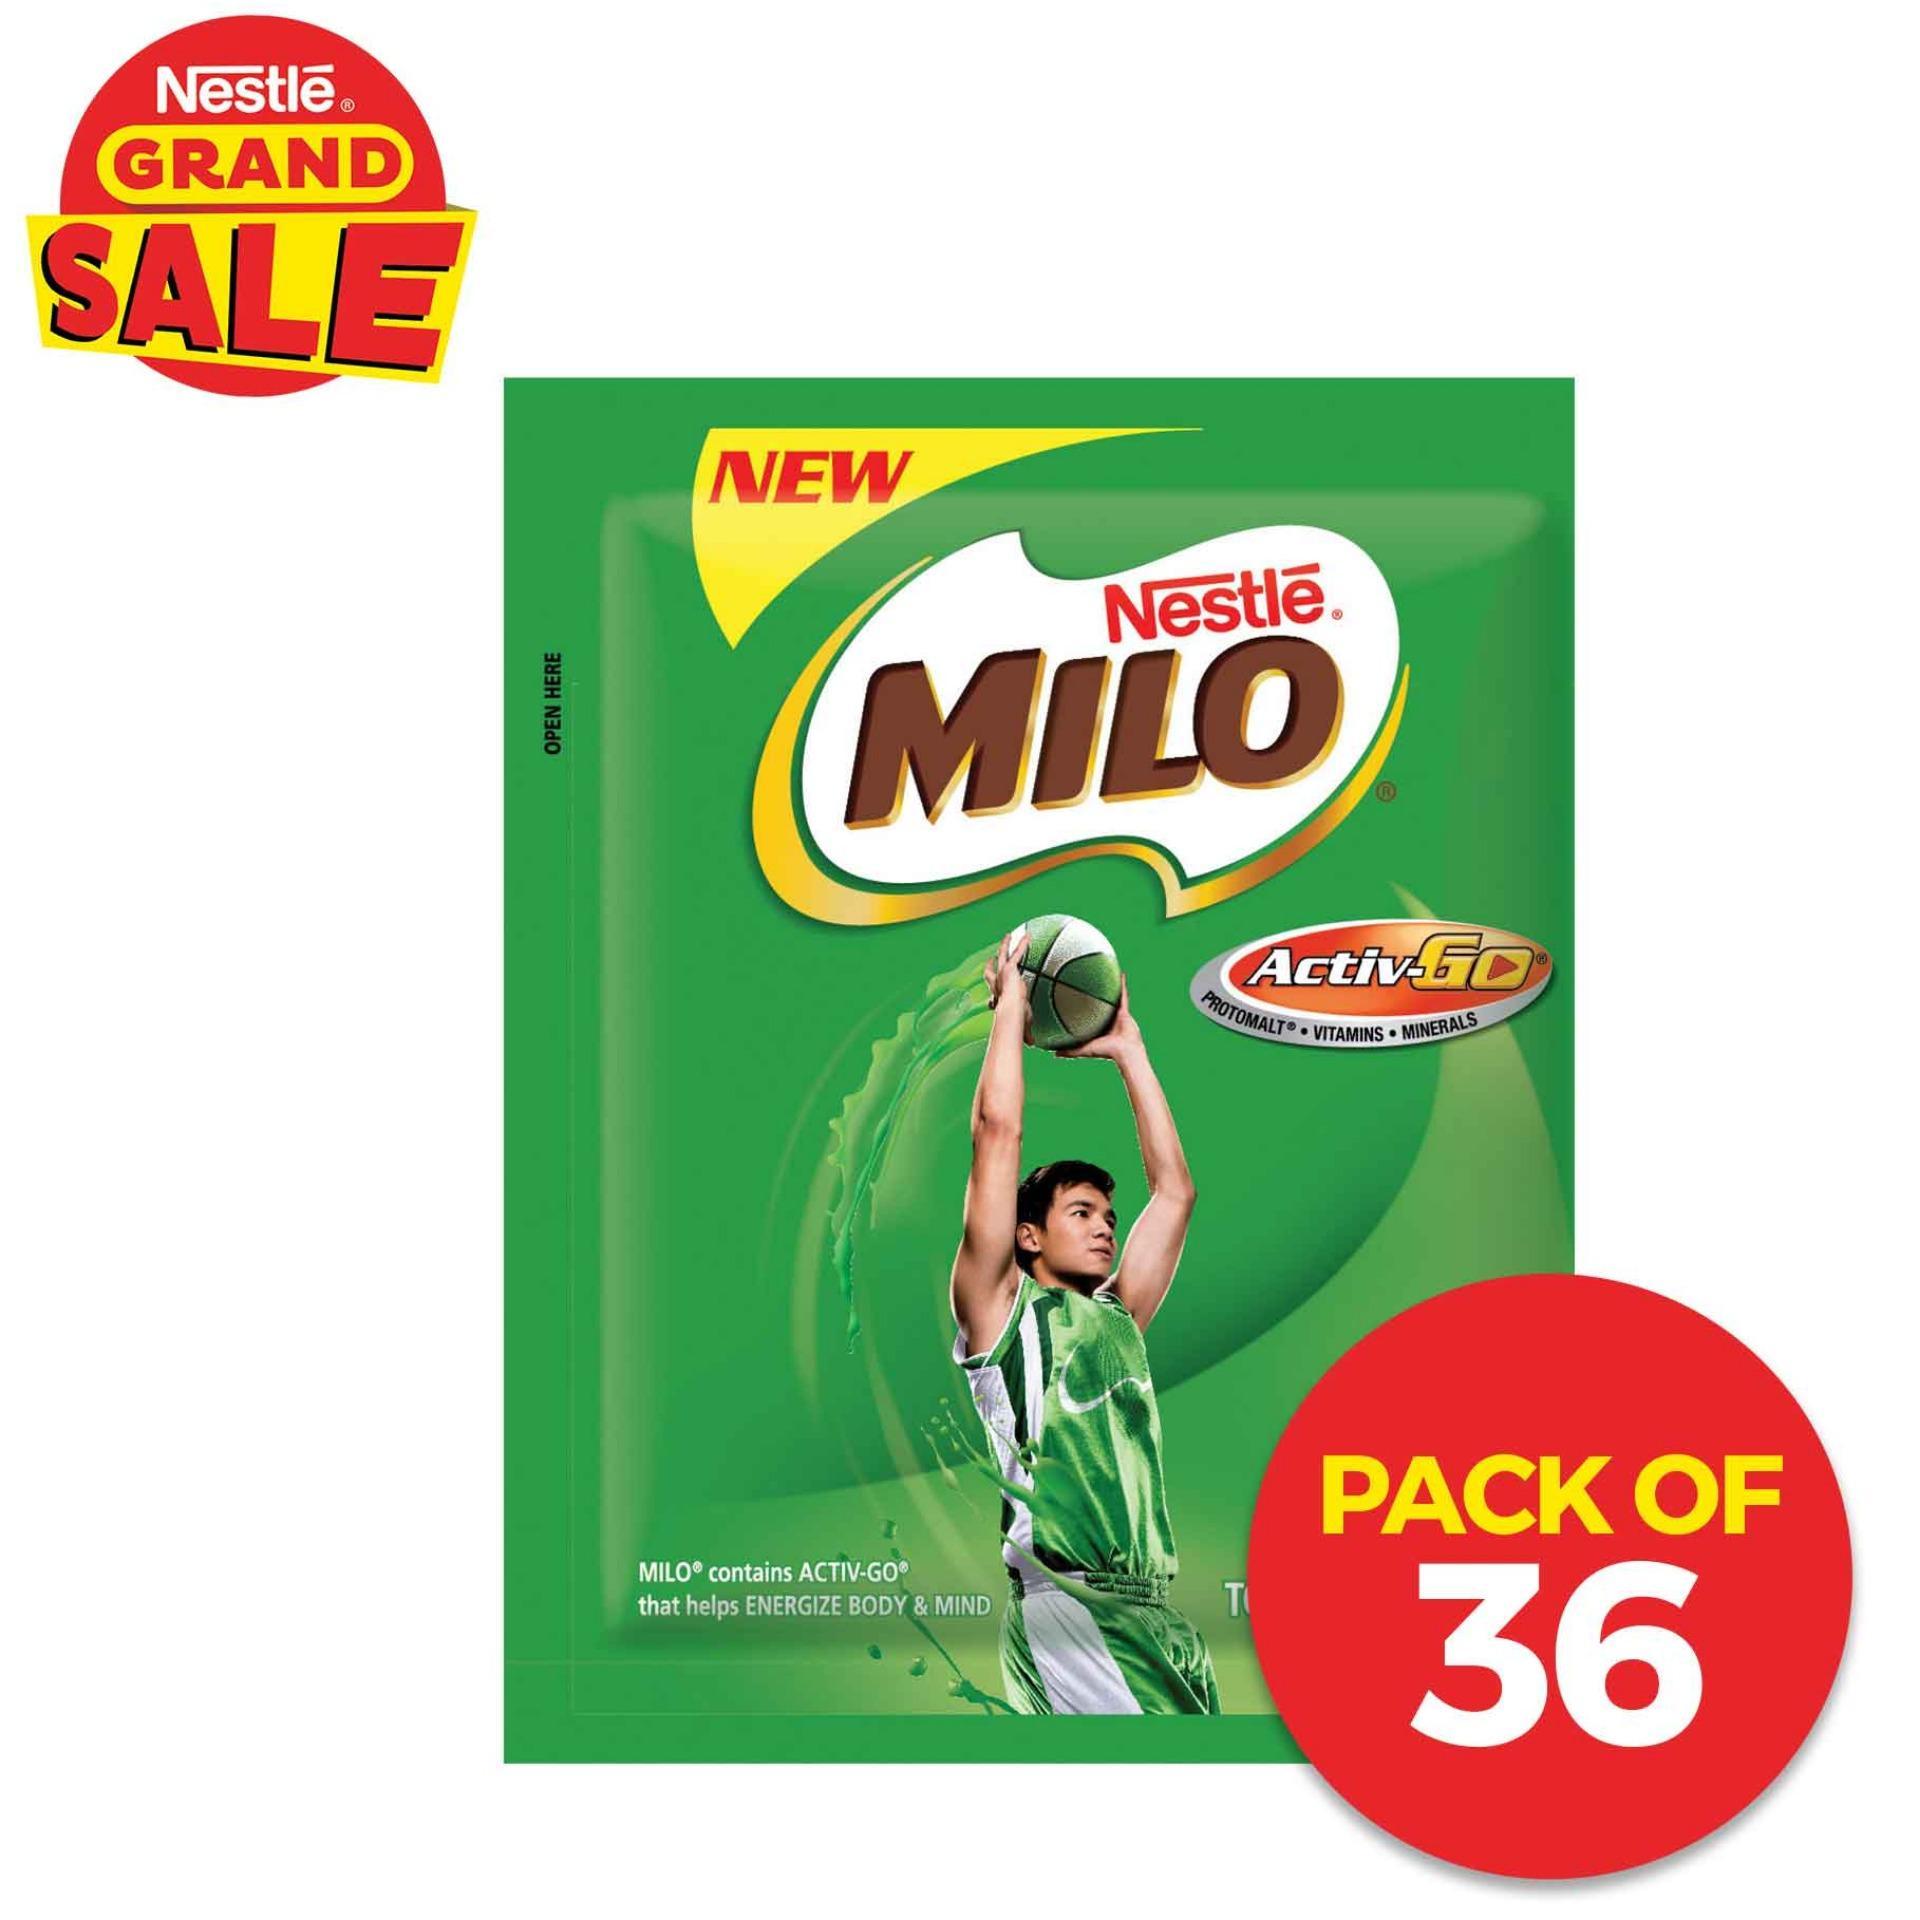 MILO ACTIV-GO Champion 22g (Pack of 36)